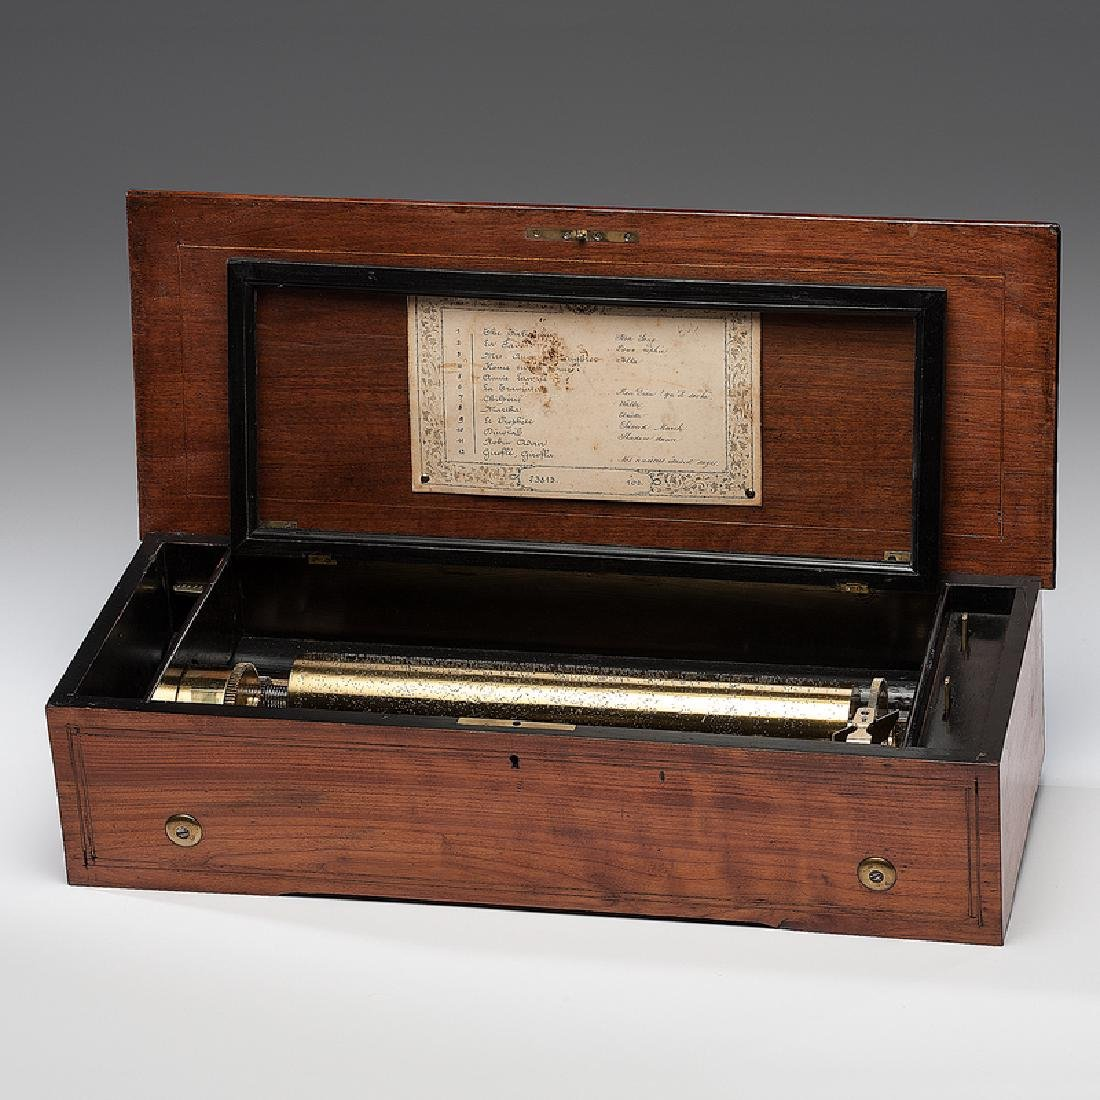 Fabrique De Geneve Twelve-Tune Cylinder Music Box